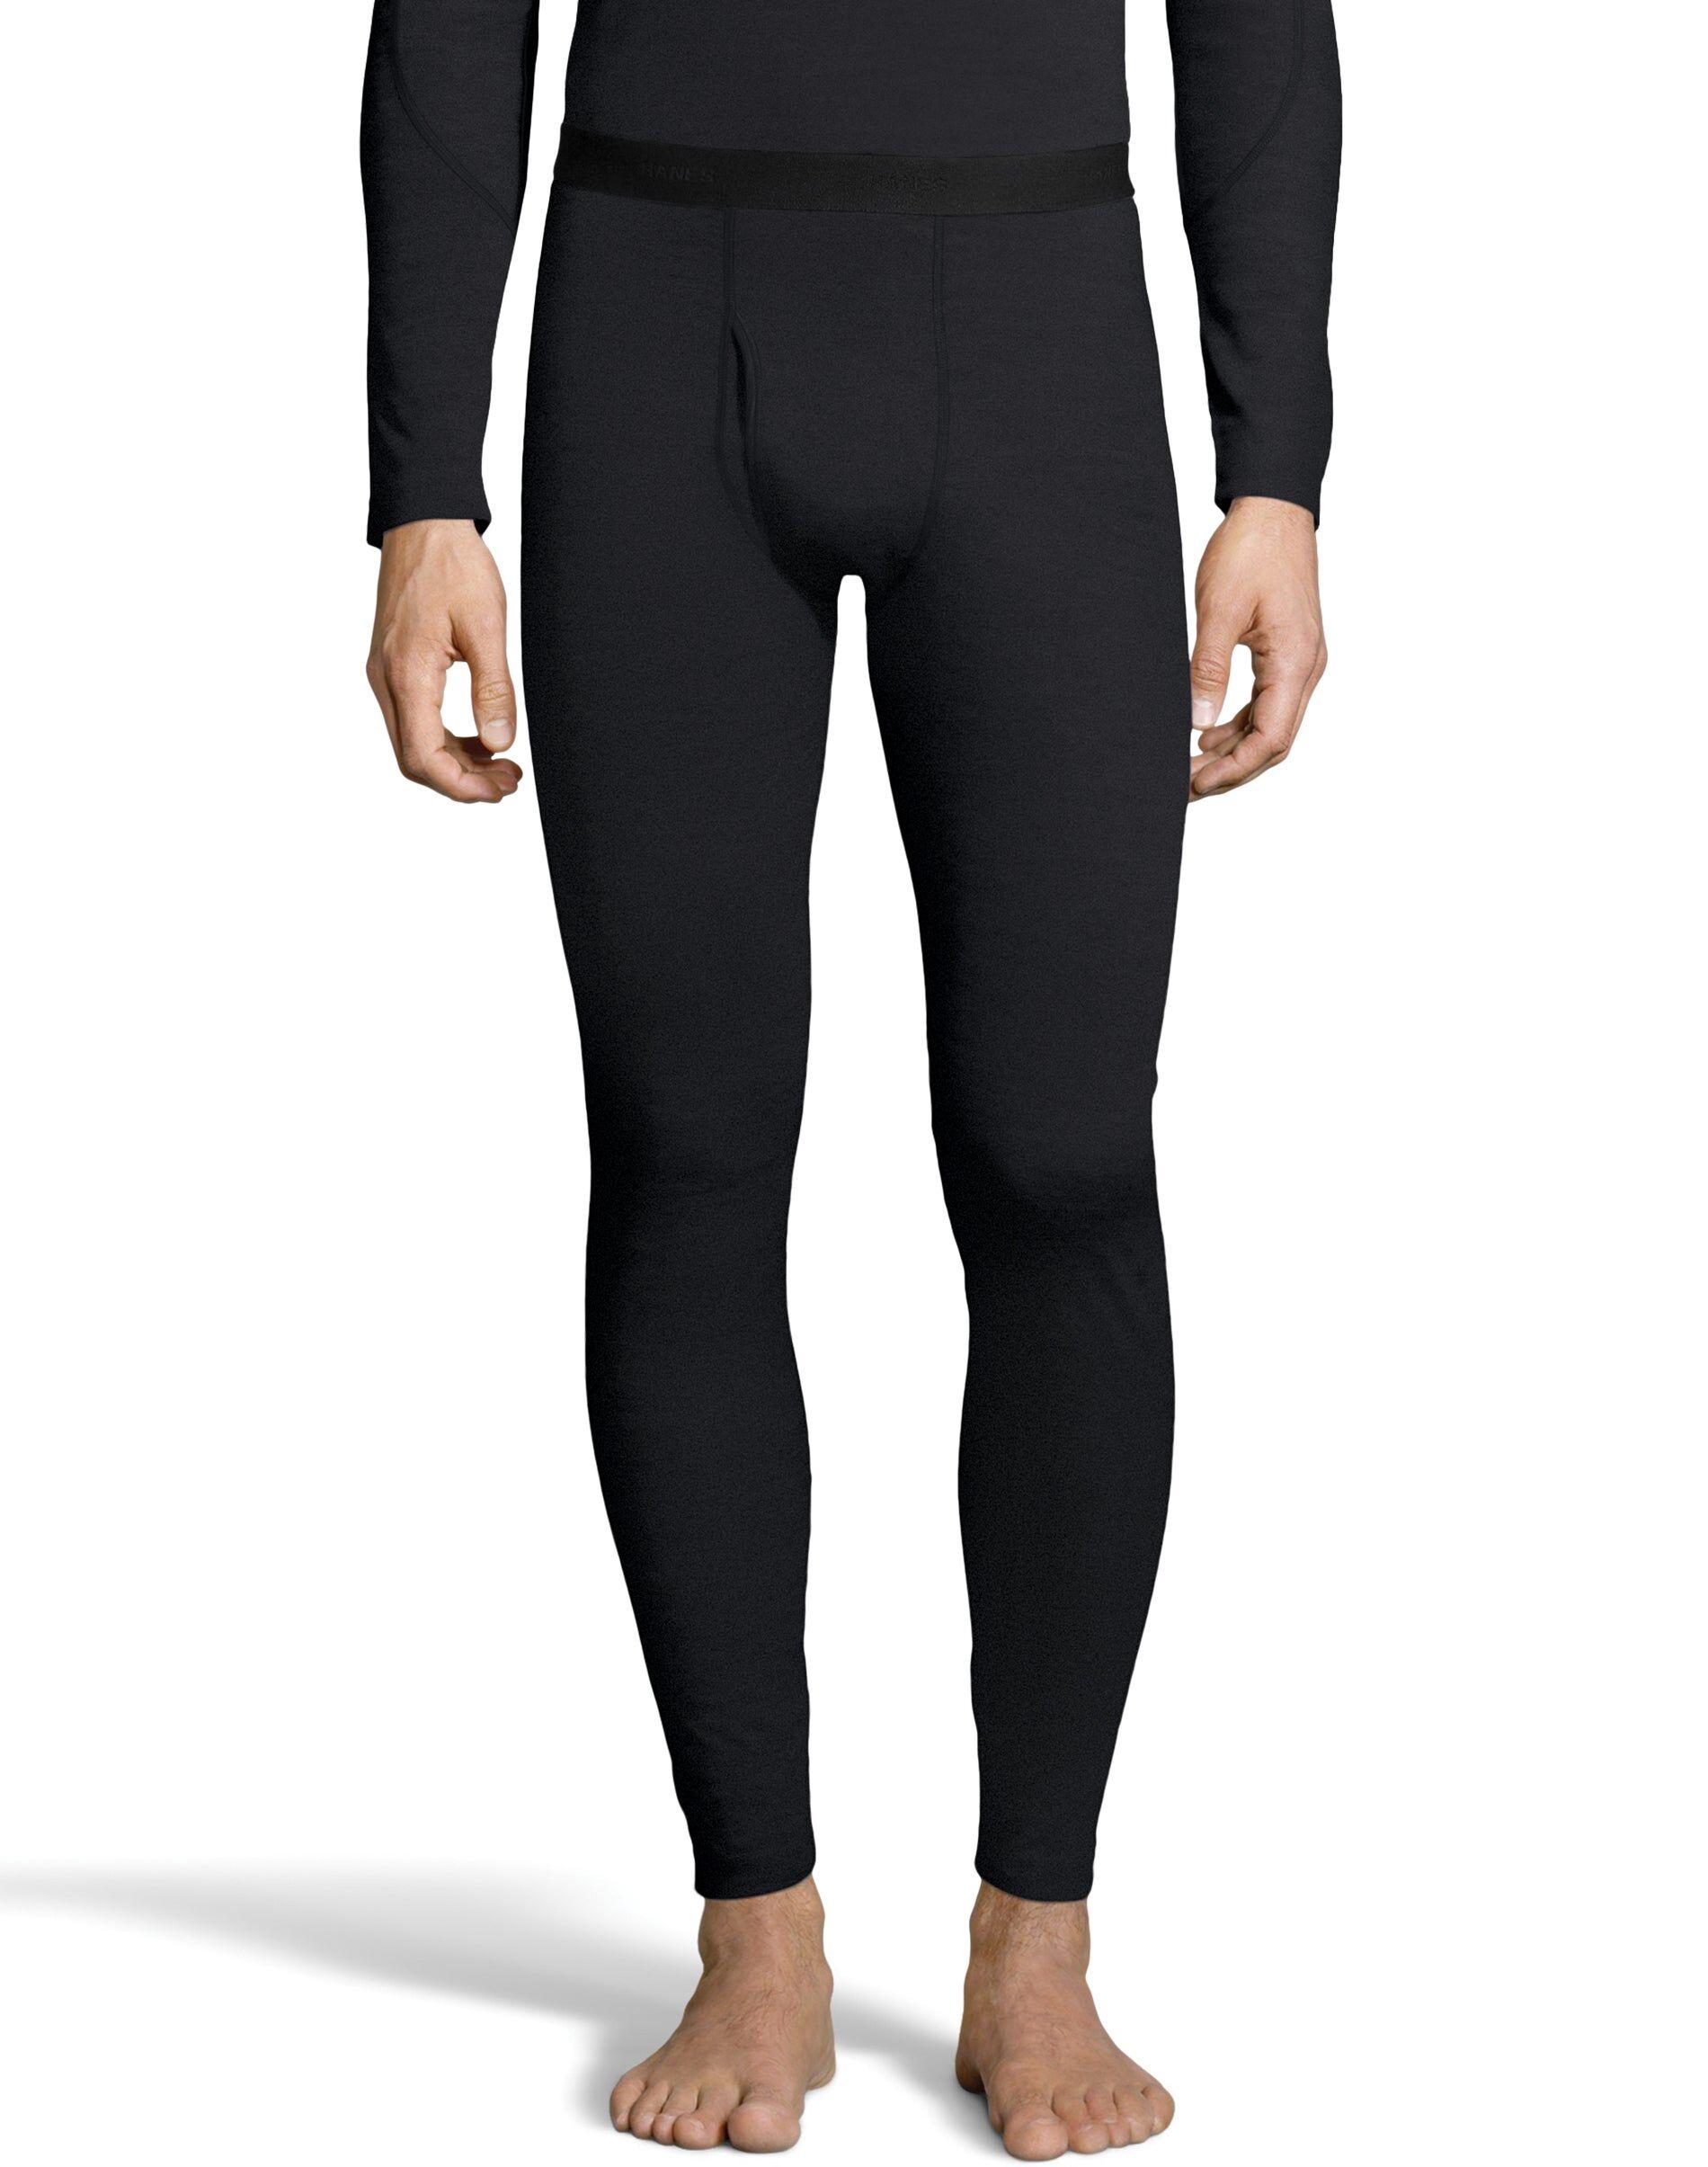 Hanes Men' Thermowool Pant Black XL